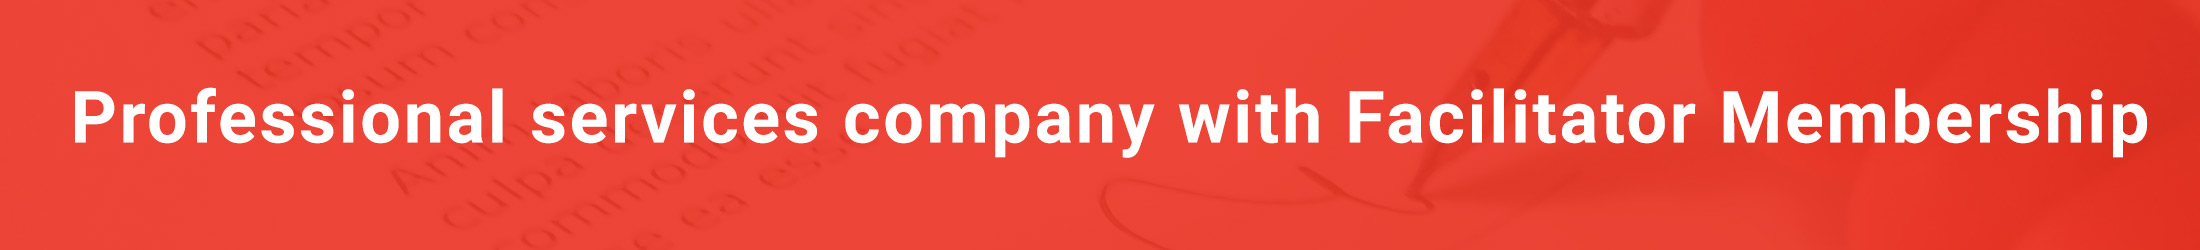 Professional services company with Facilitator Membership